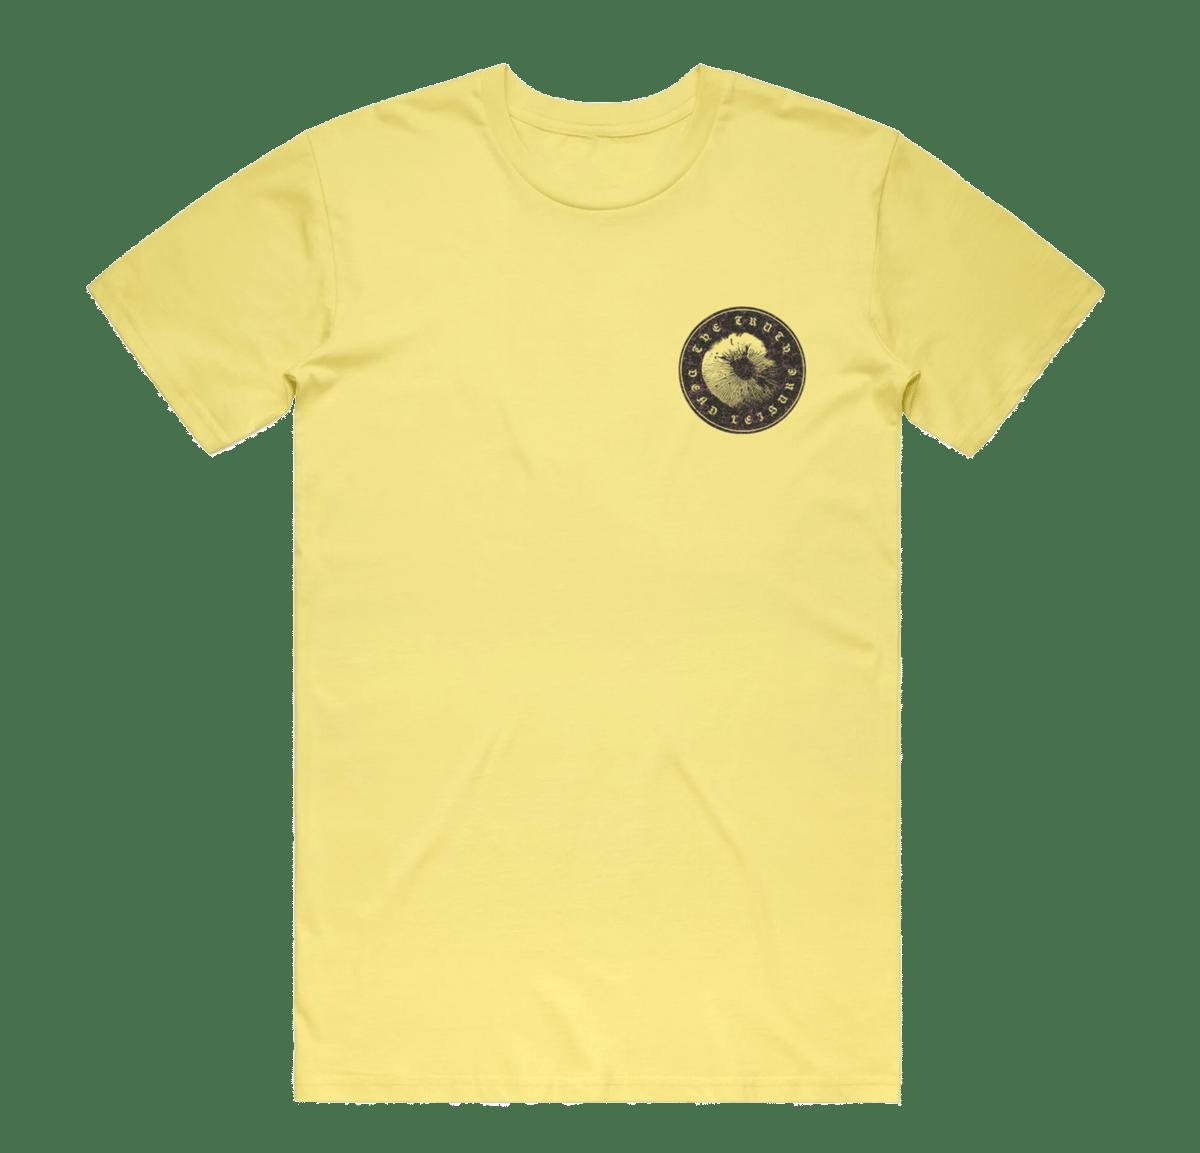 Spore T-shirt - Lemon